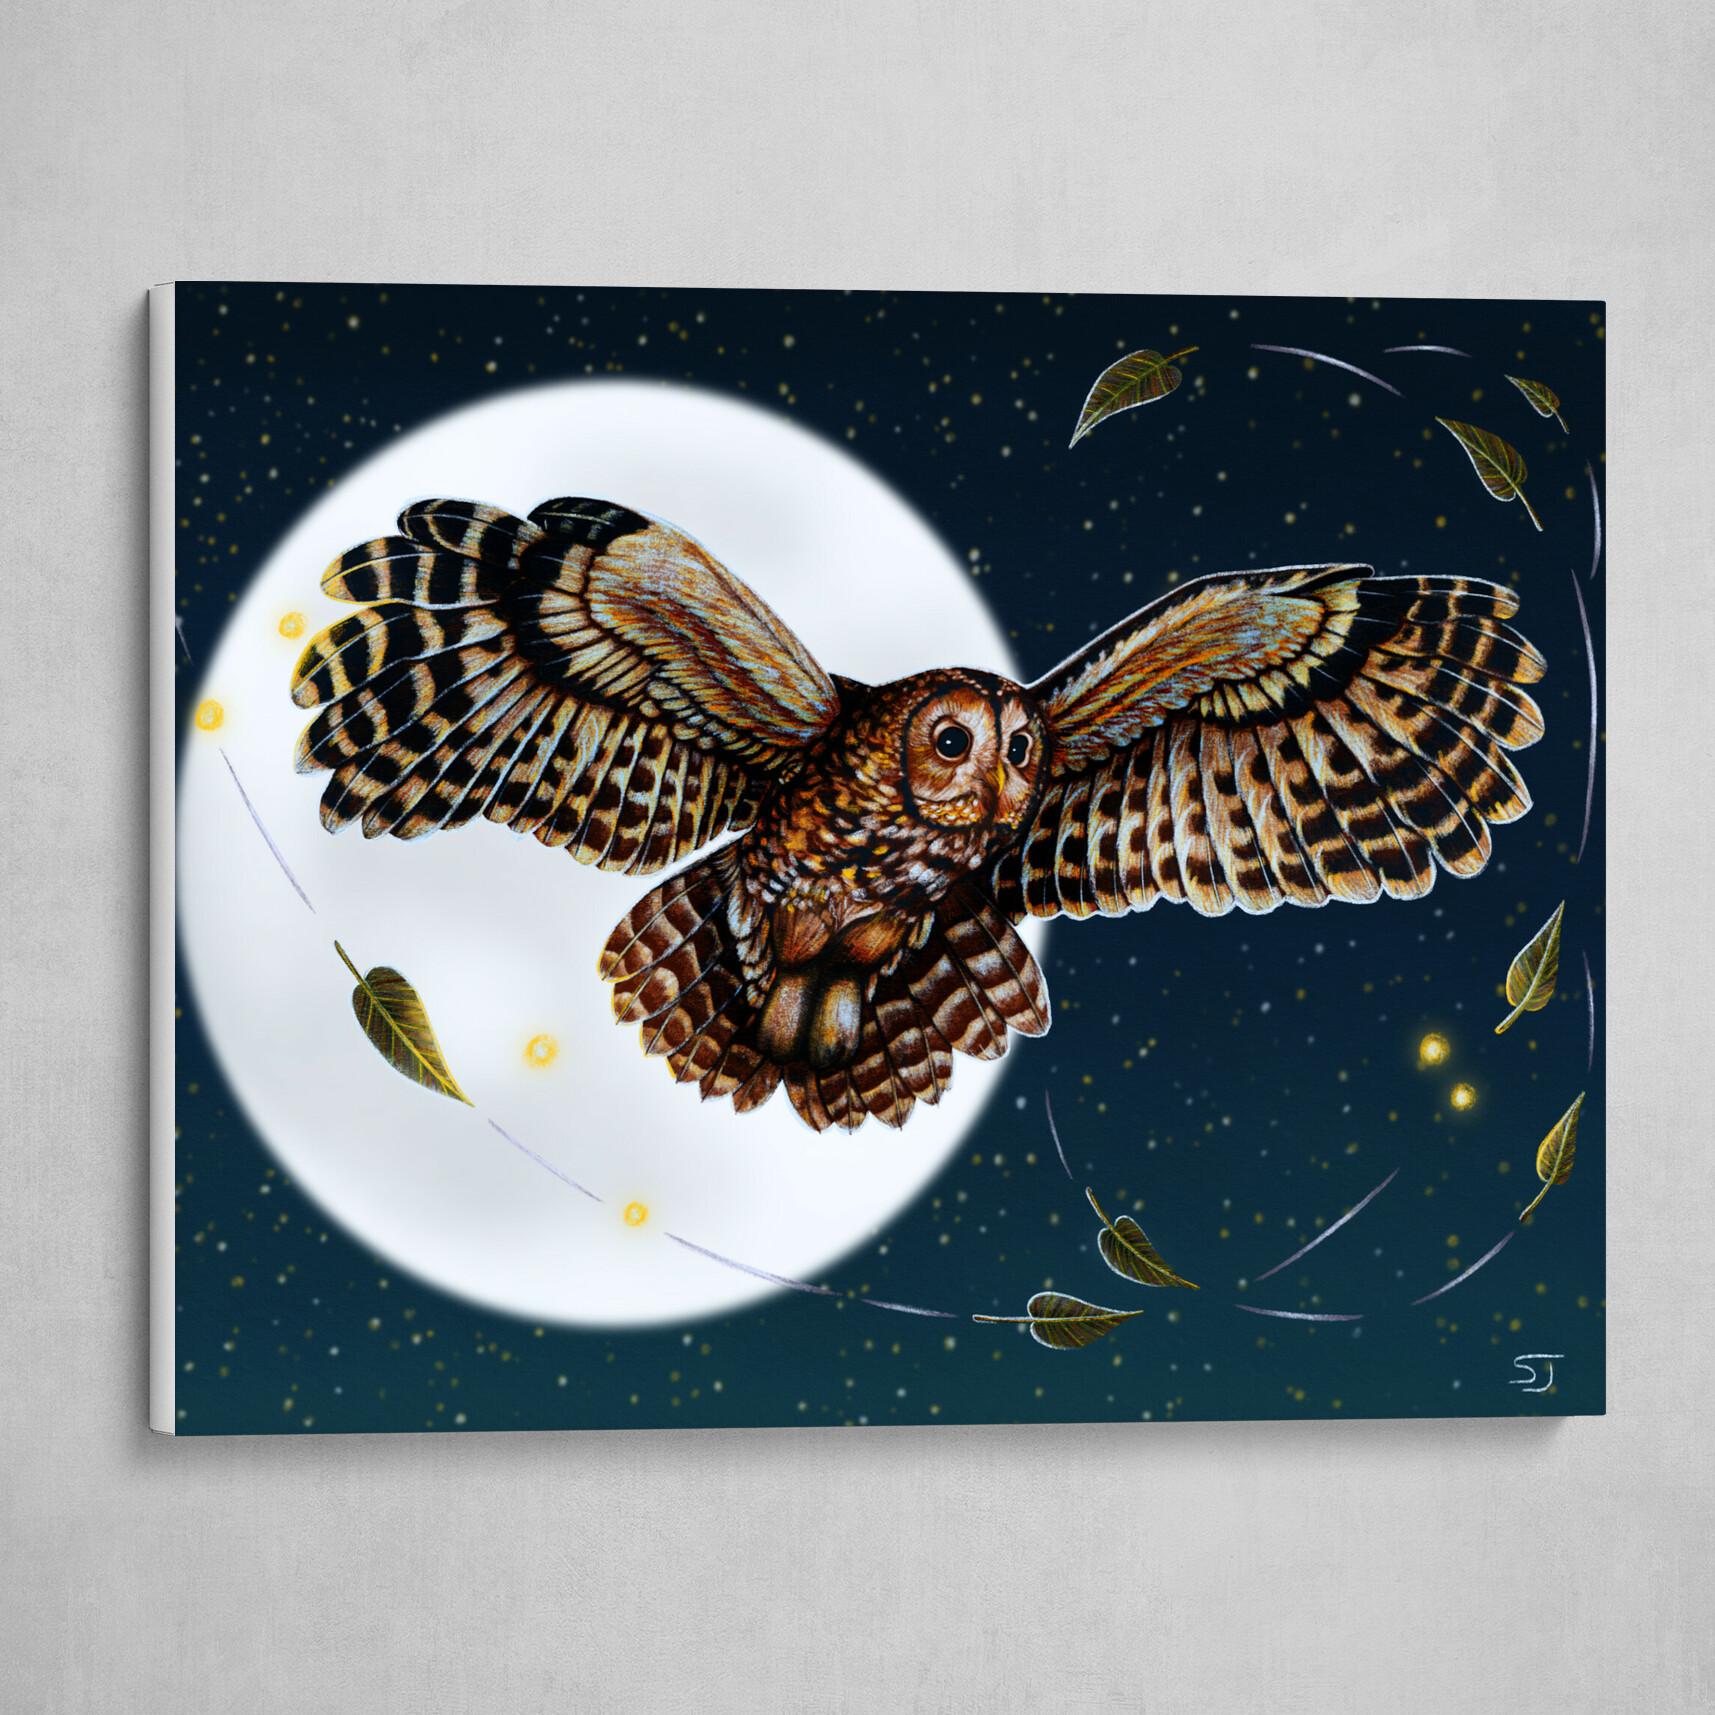 Tawny Owl in the Night Sky